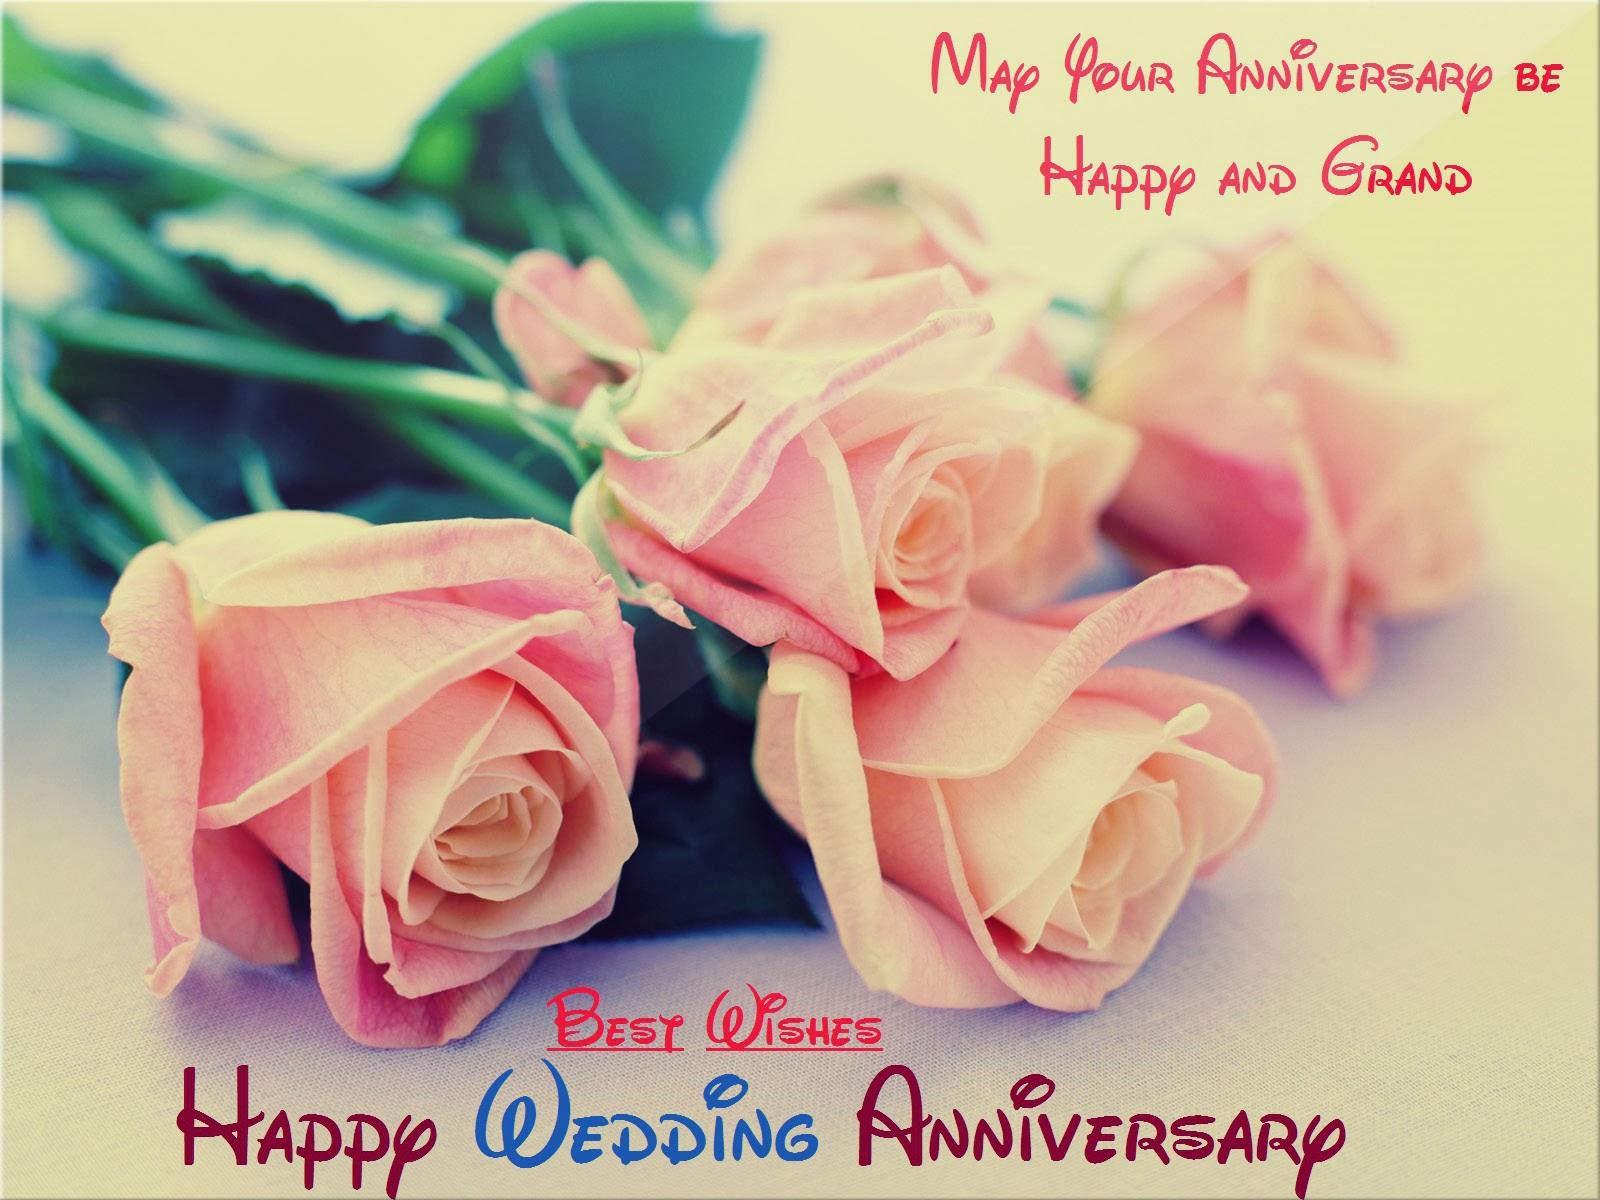 Best Wishes Happy Wedding Anniversary Freedownloadcomhr